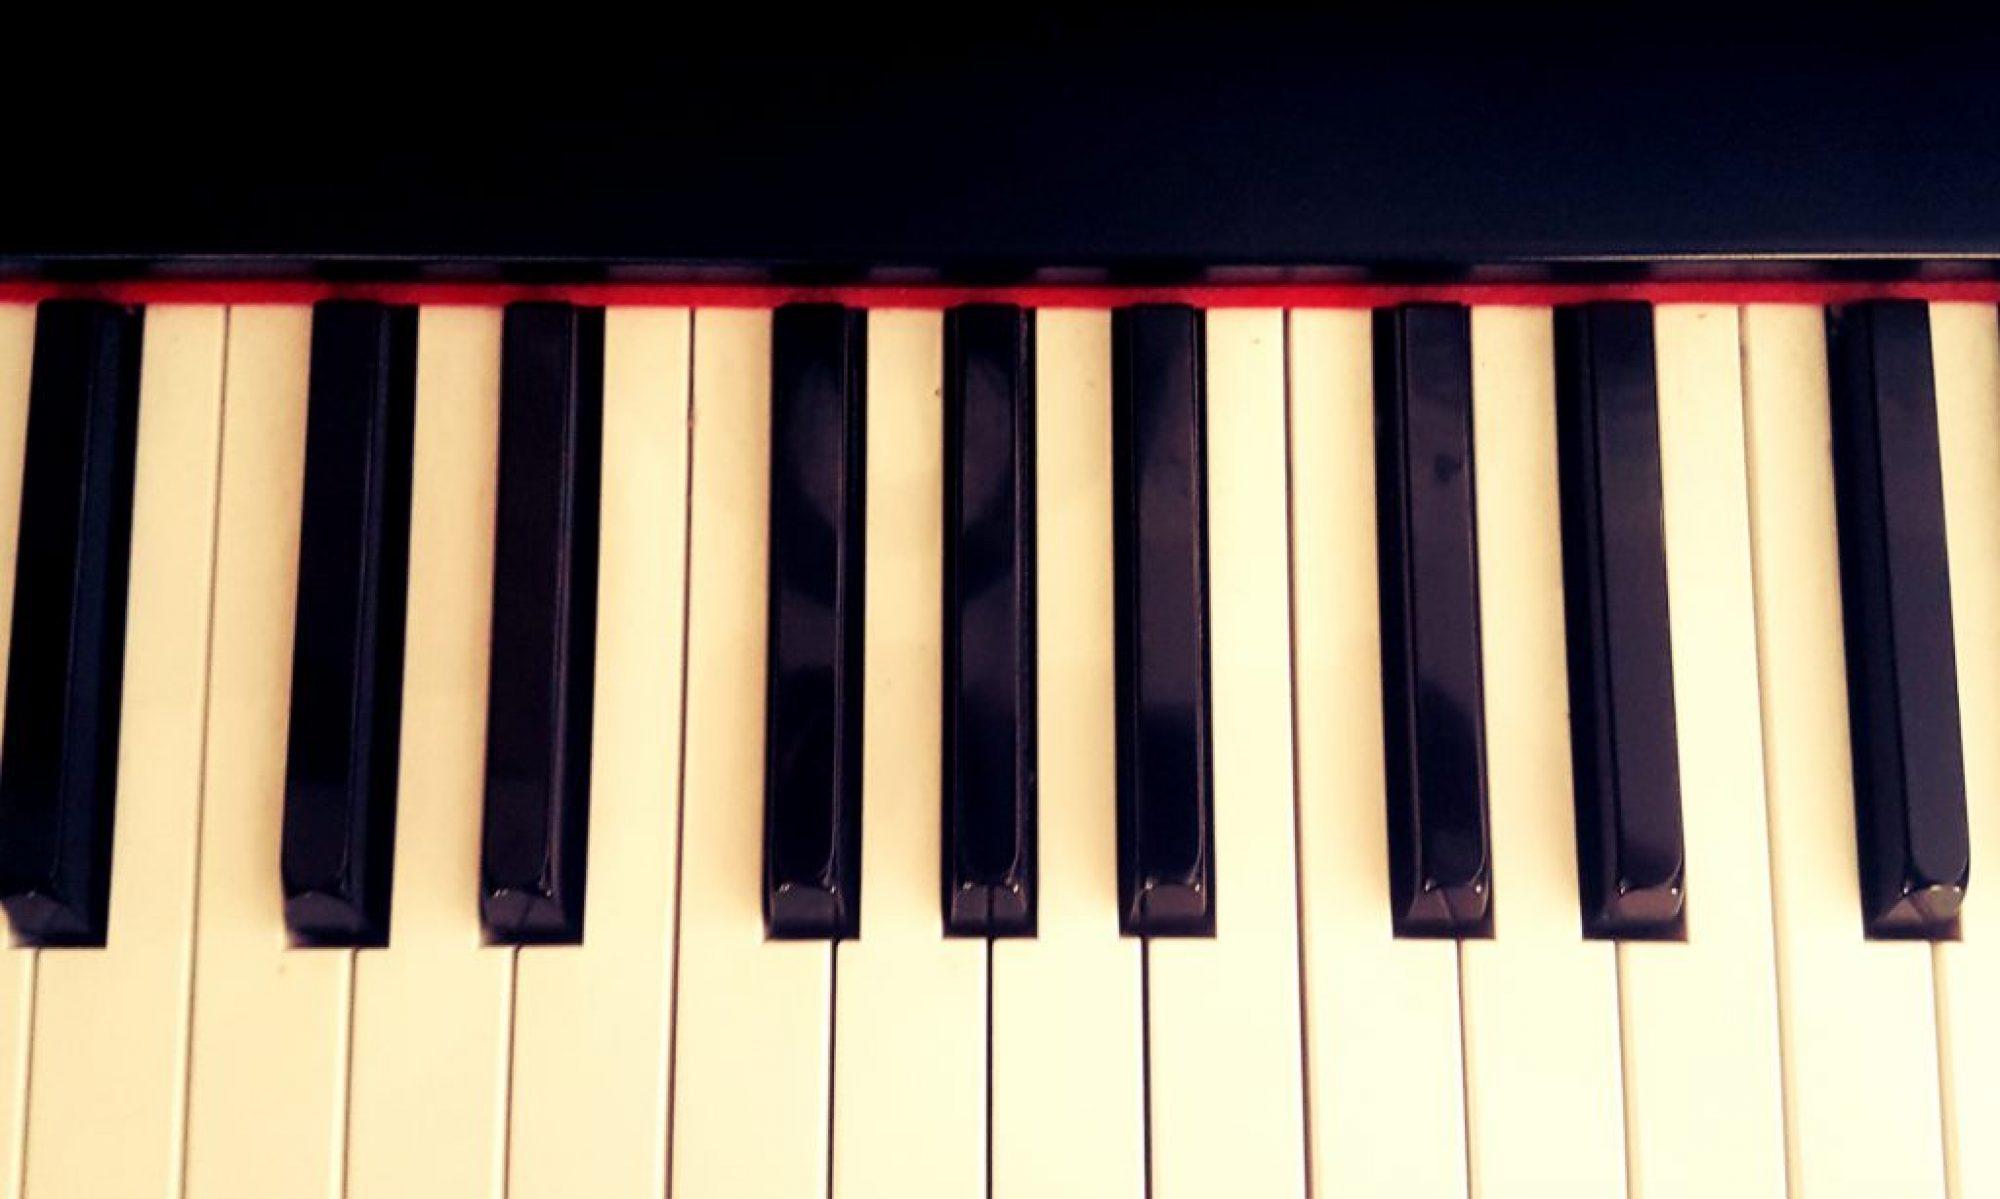 Musique au Collège Denfert-Rochereau